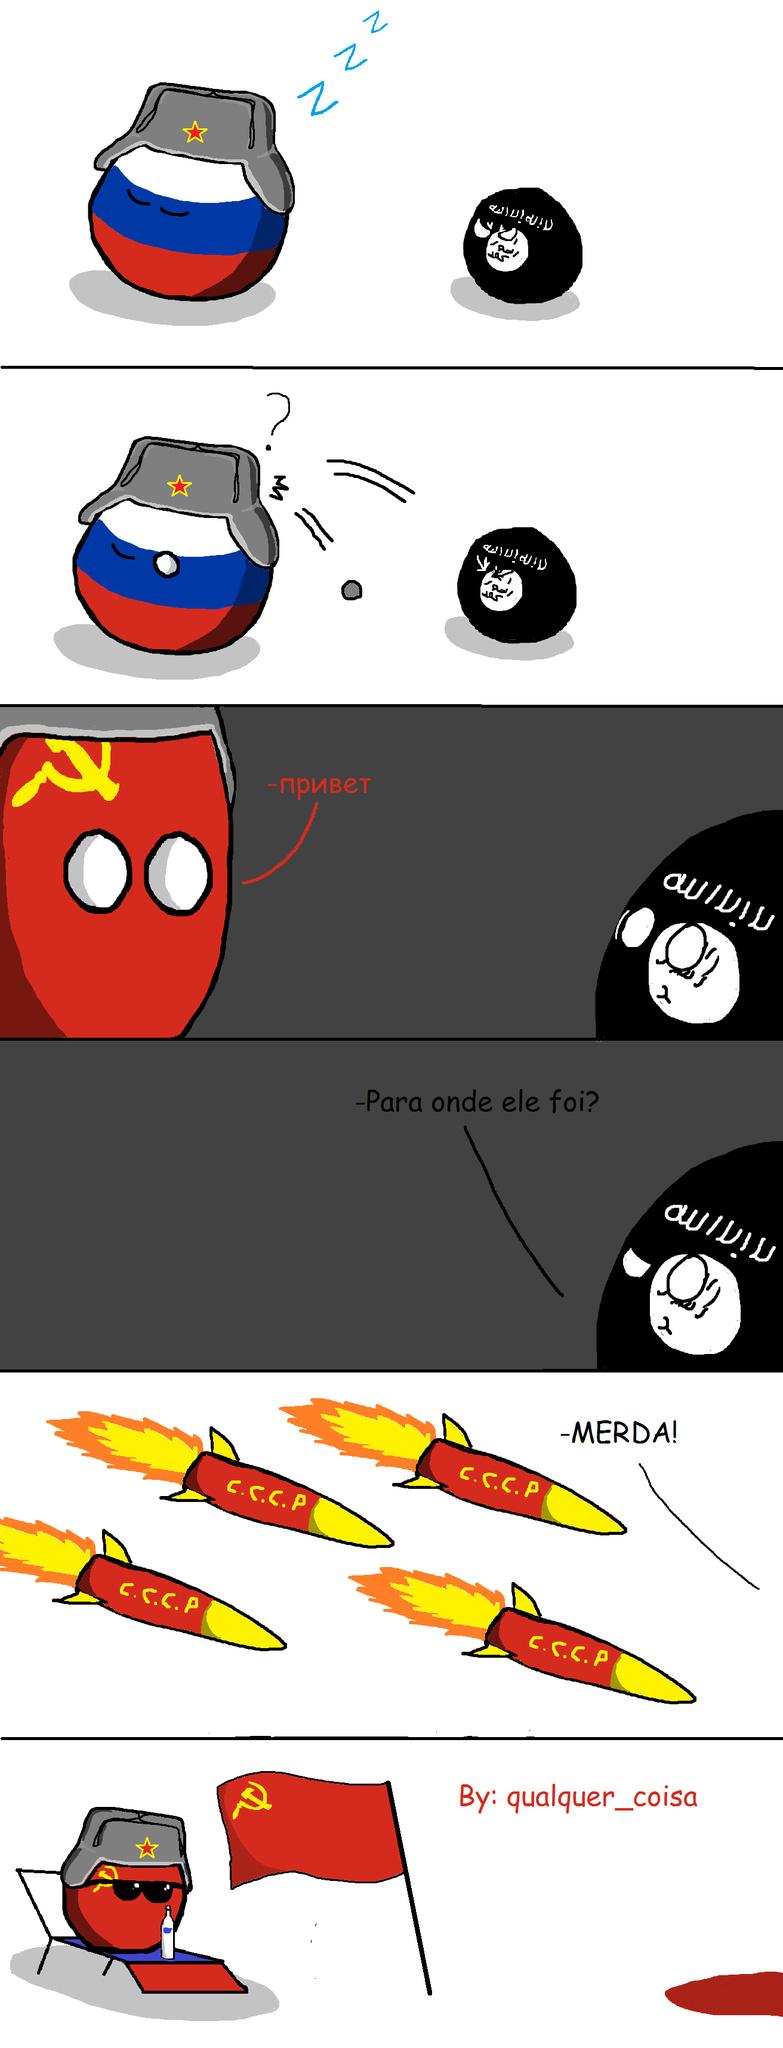 Stalin matou pouco - meme